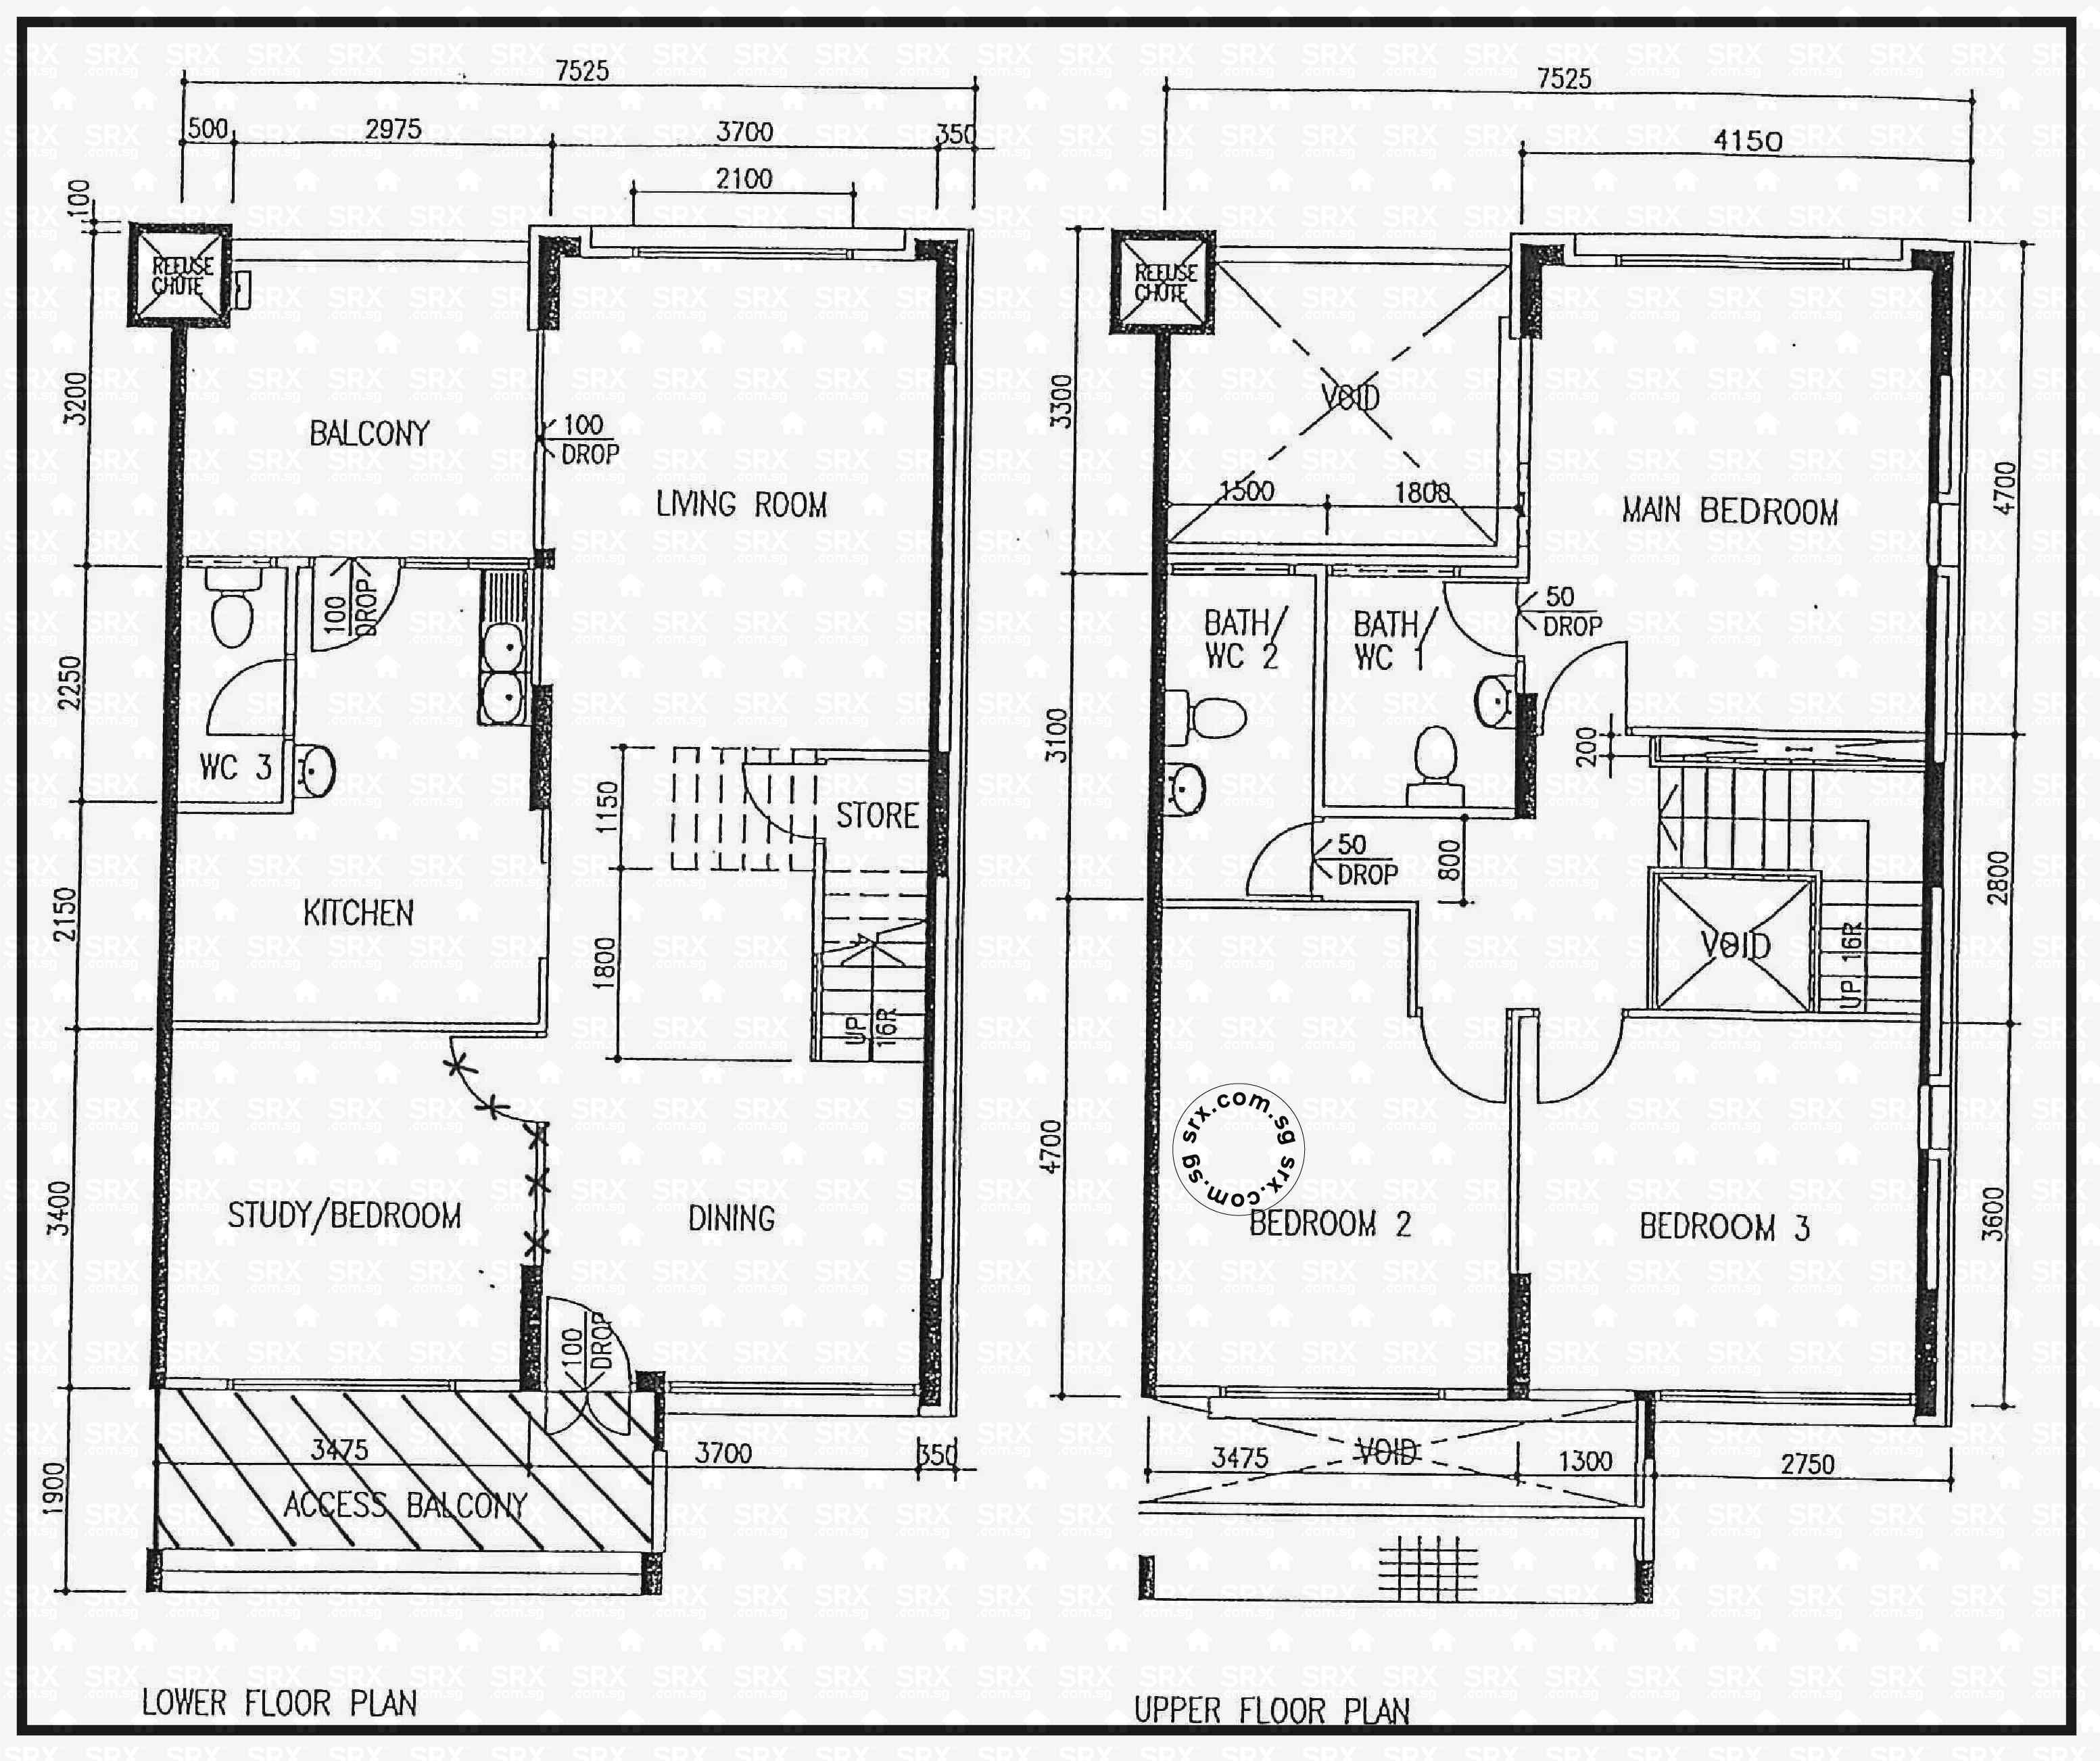 Pasir ris street 12 hdb details srx property for 509 plans